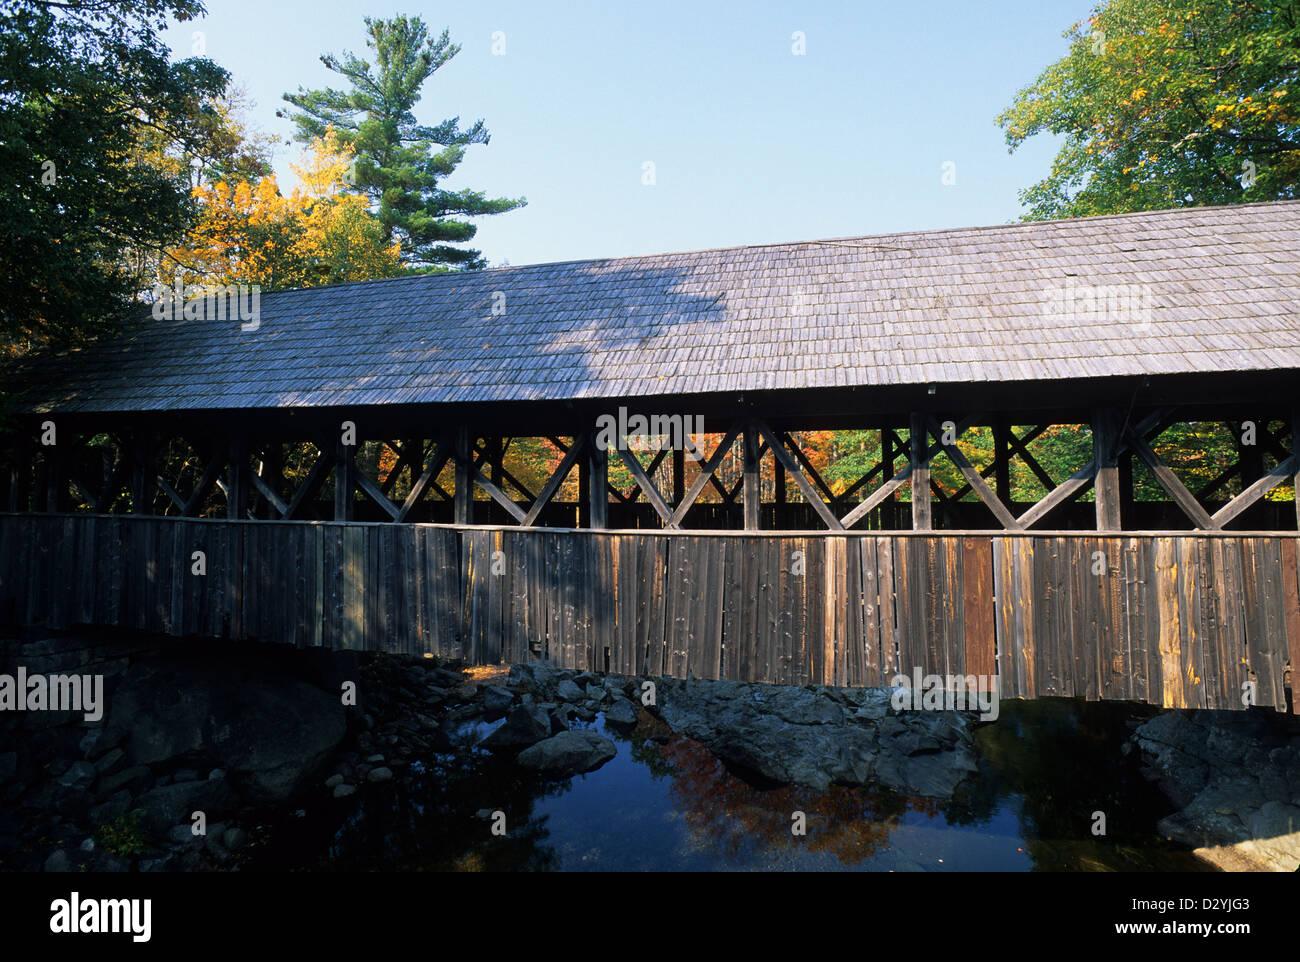 Elk282-1050, Bethel, Maine Sunday River pont couvert avec Photo Stock